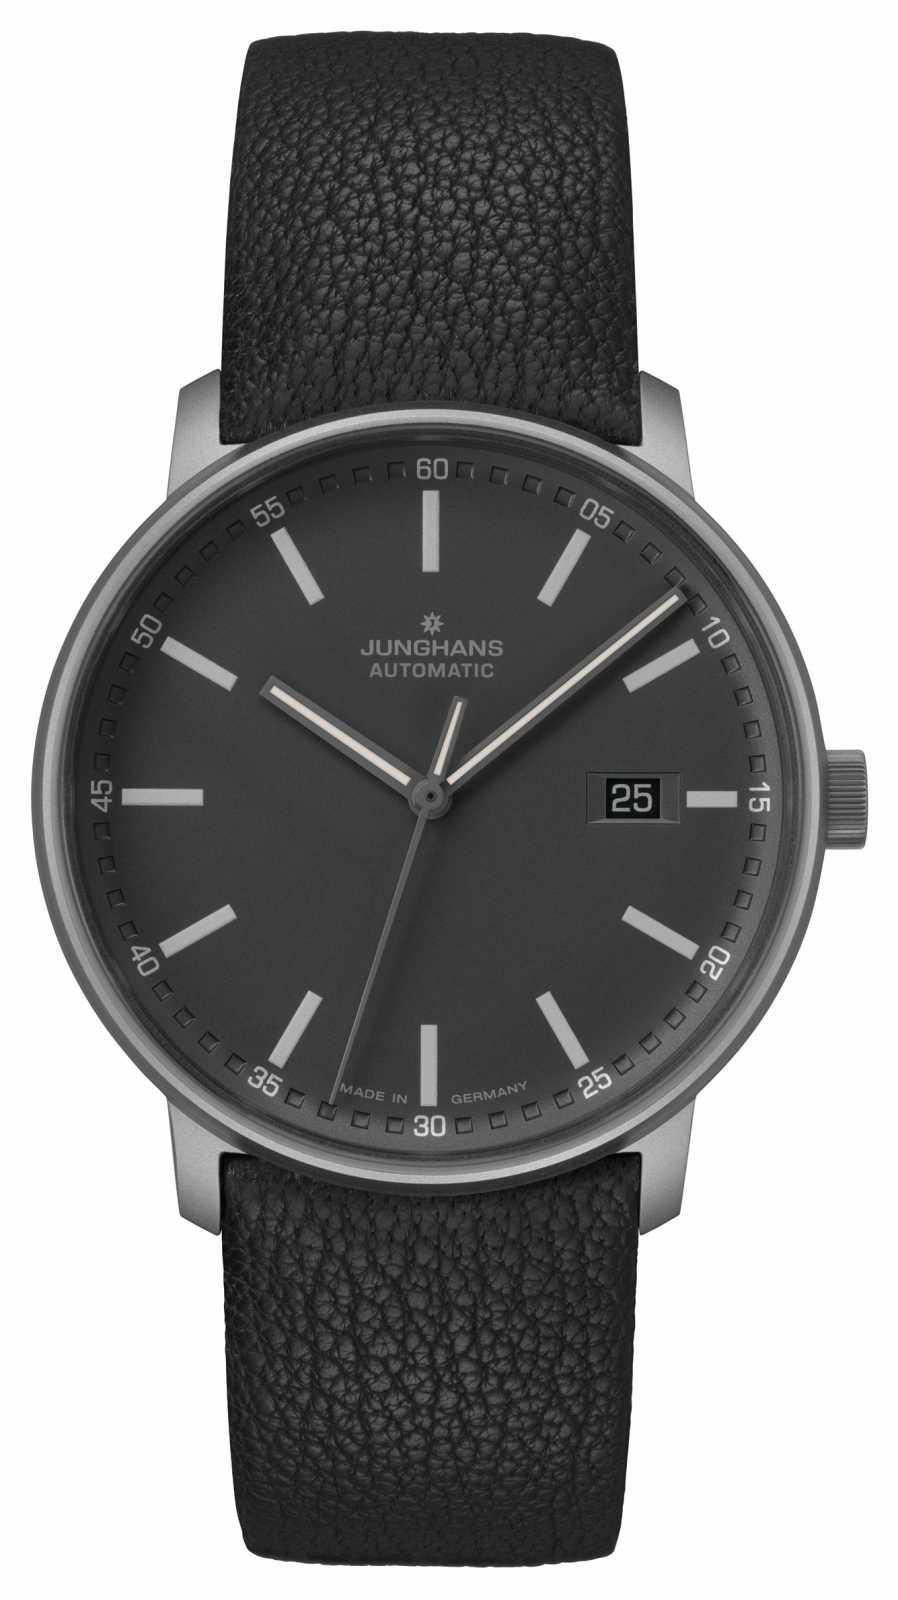 Junghans FORM A   Titan   Automatic   Black Leather Strap   027/2001.00